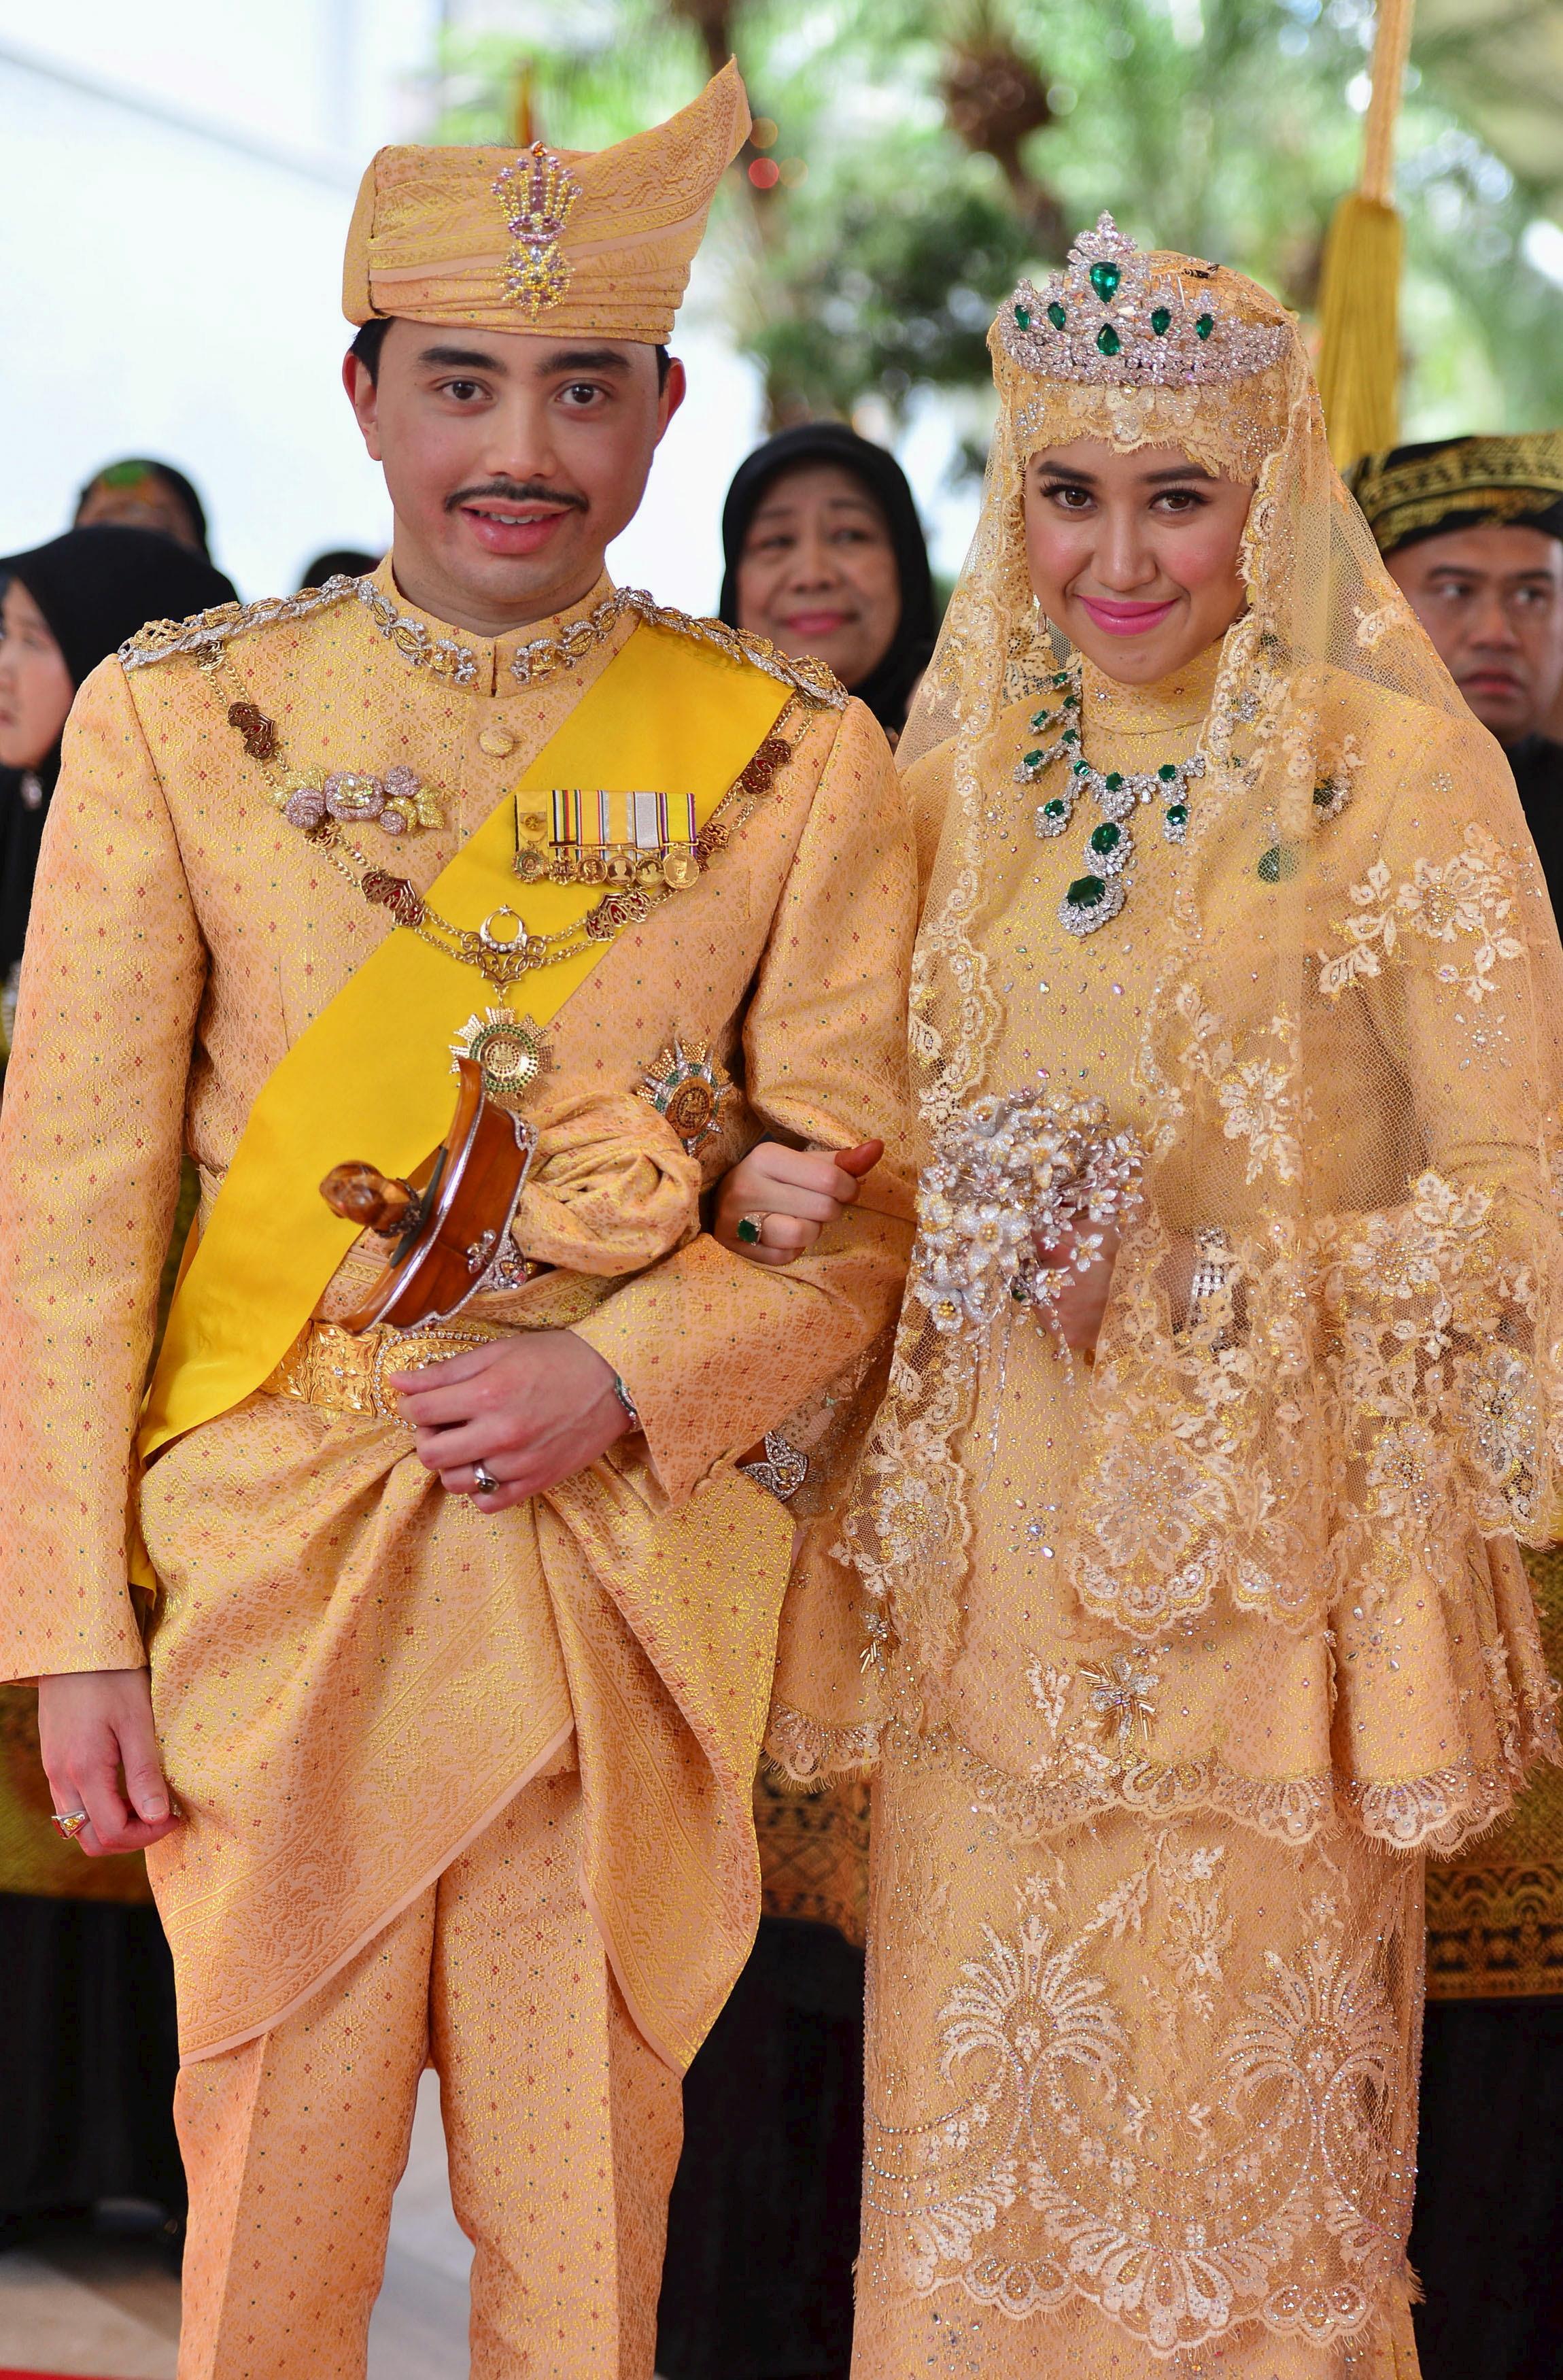 Brunei's newly wed royal couple, Prince Abdul Malik and Dayangku Raabi'atul 'Adawiyyah Pengiran Haji Bolkiah, pose for photographers after the  bersanding  or enthronement ceremony at their wedding in the Nurul Iman Palace in Bandar Seri Begawan, Brunei, on April 12, 2015